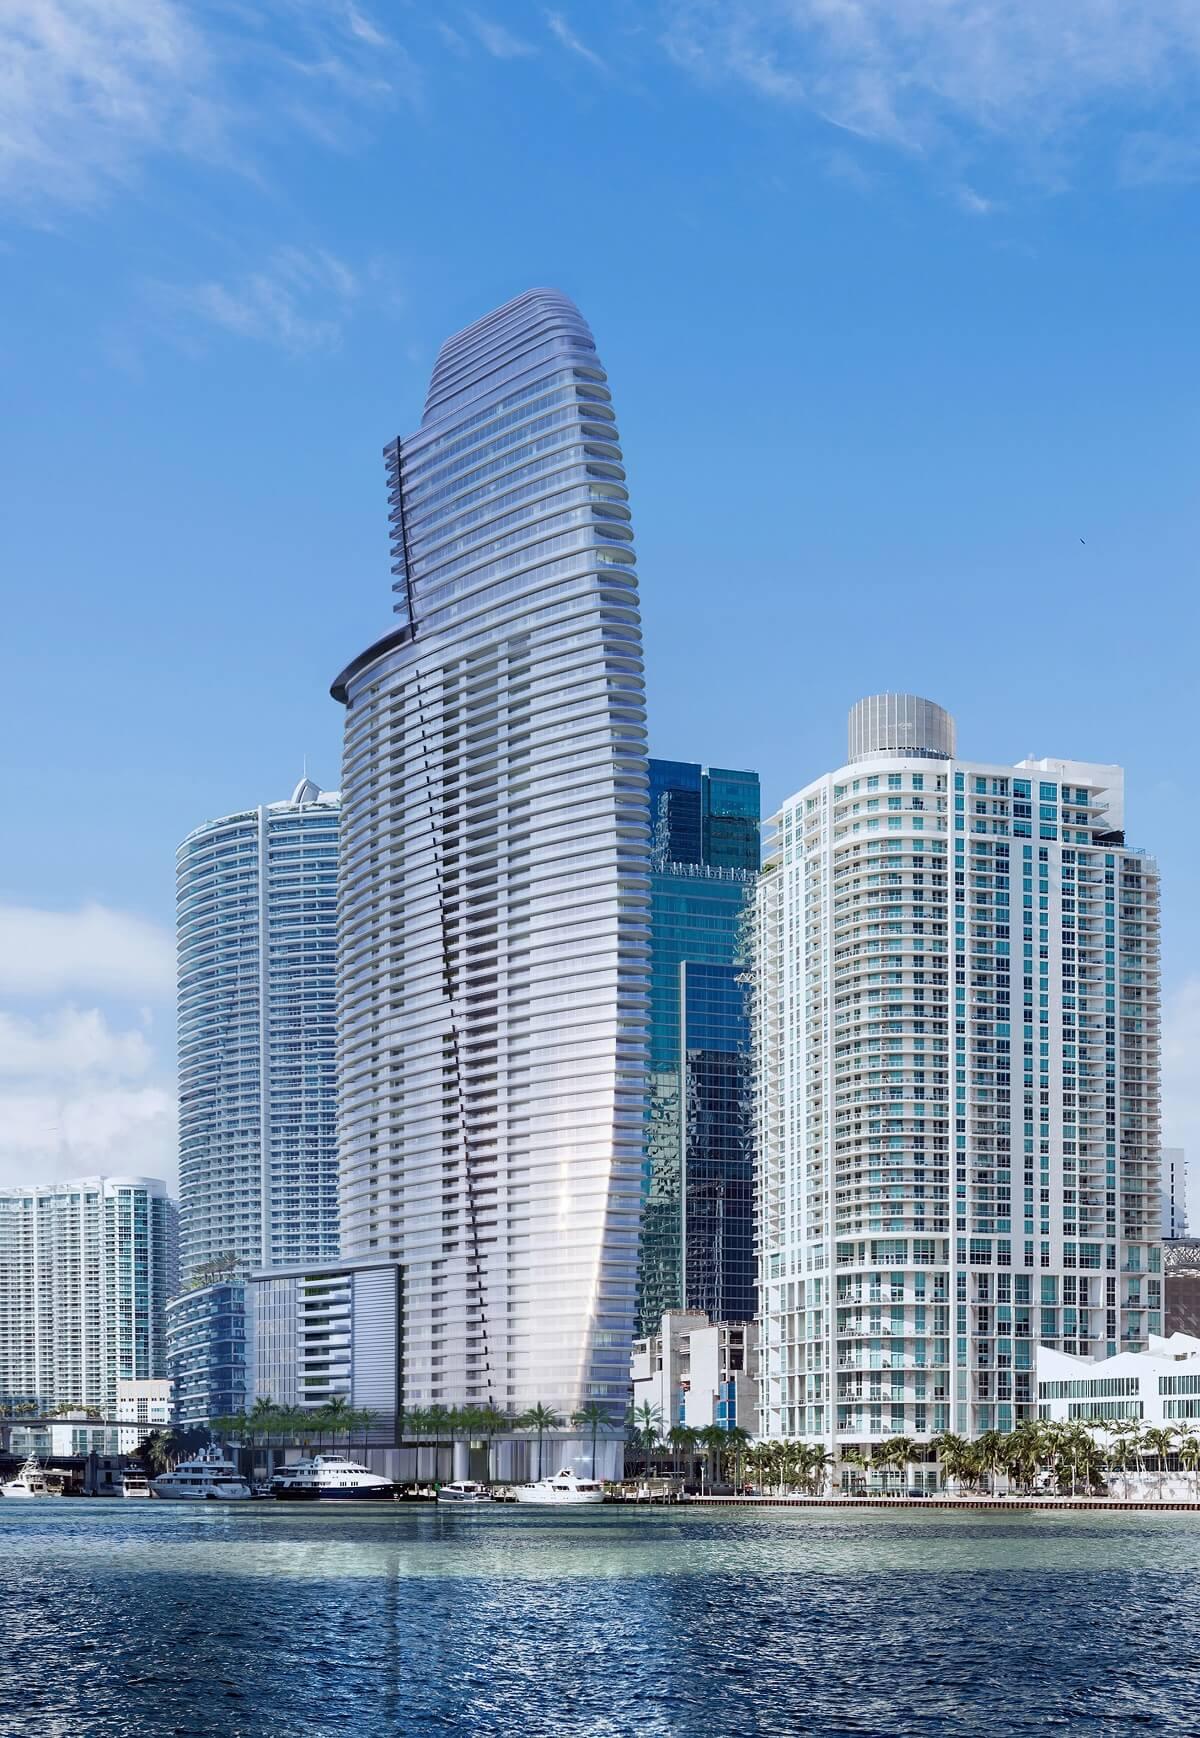 aston-martin-residences-at-300-biscayne-boulevard-7-jpg-3.jpg